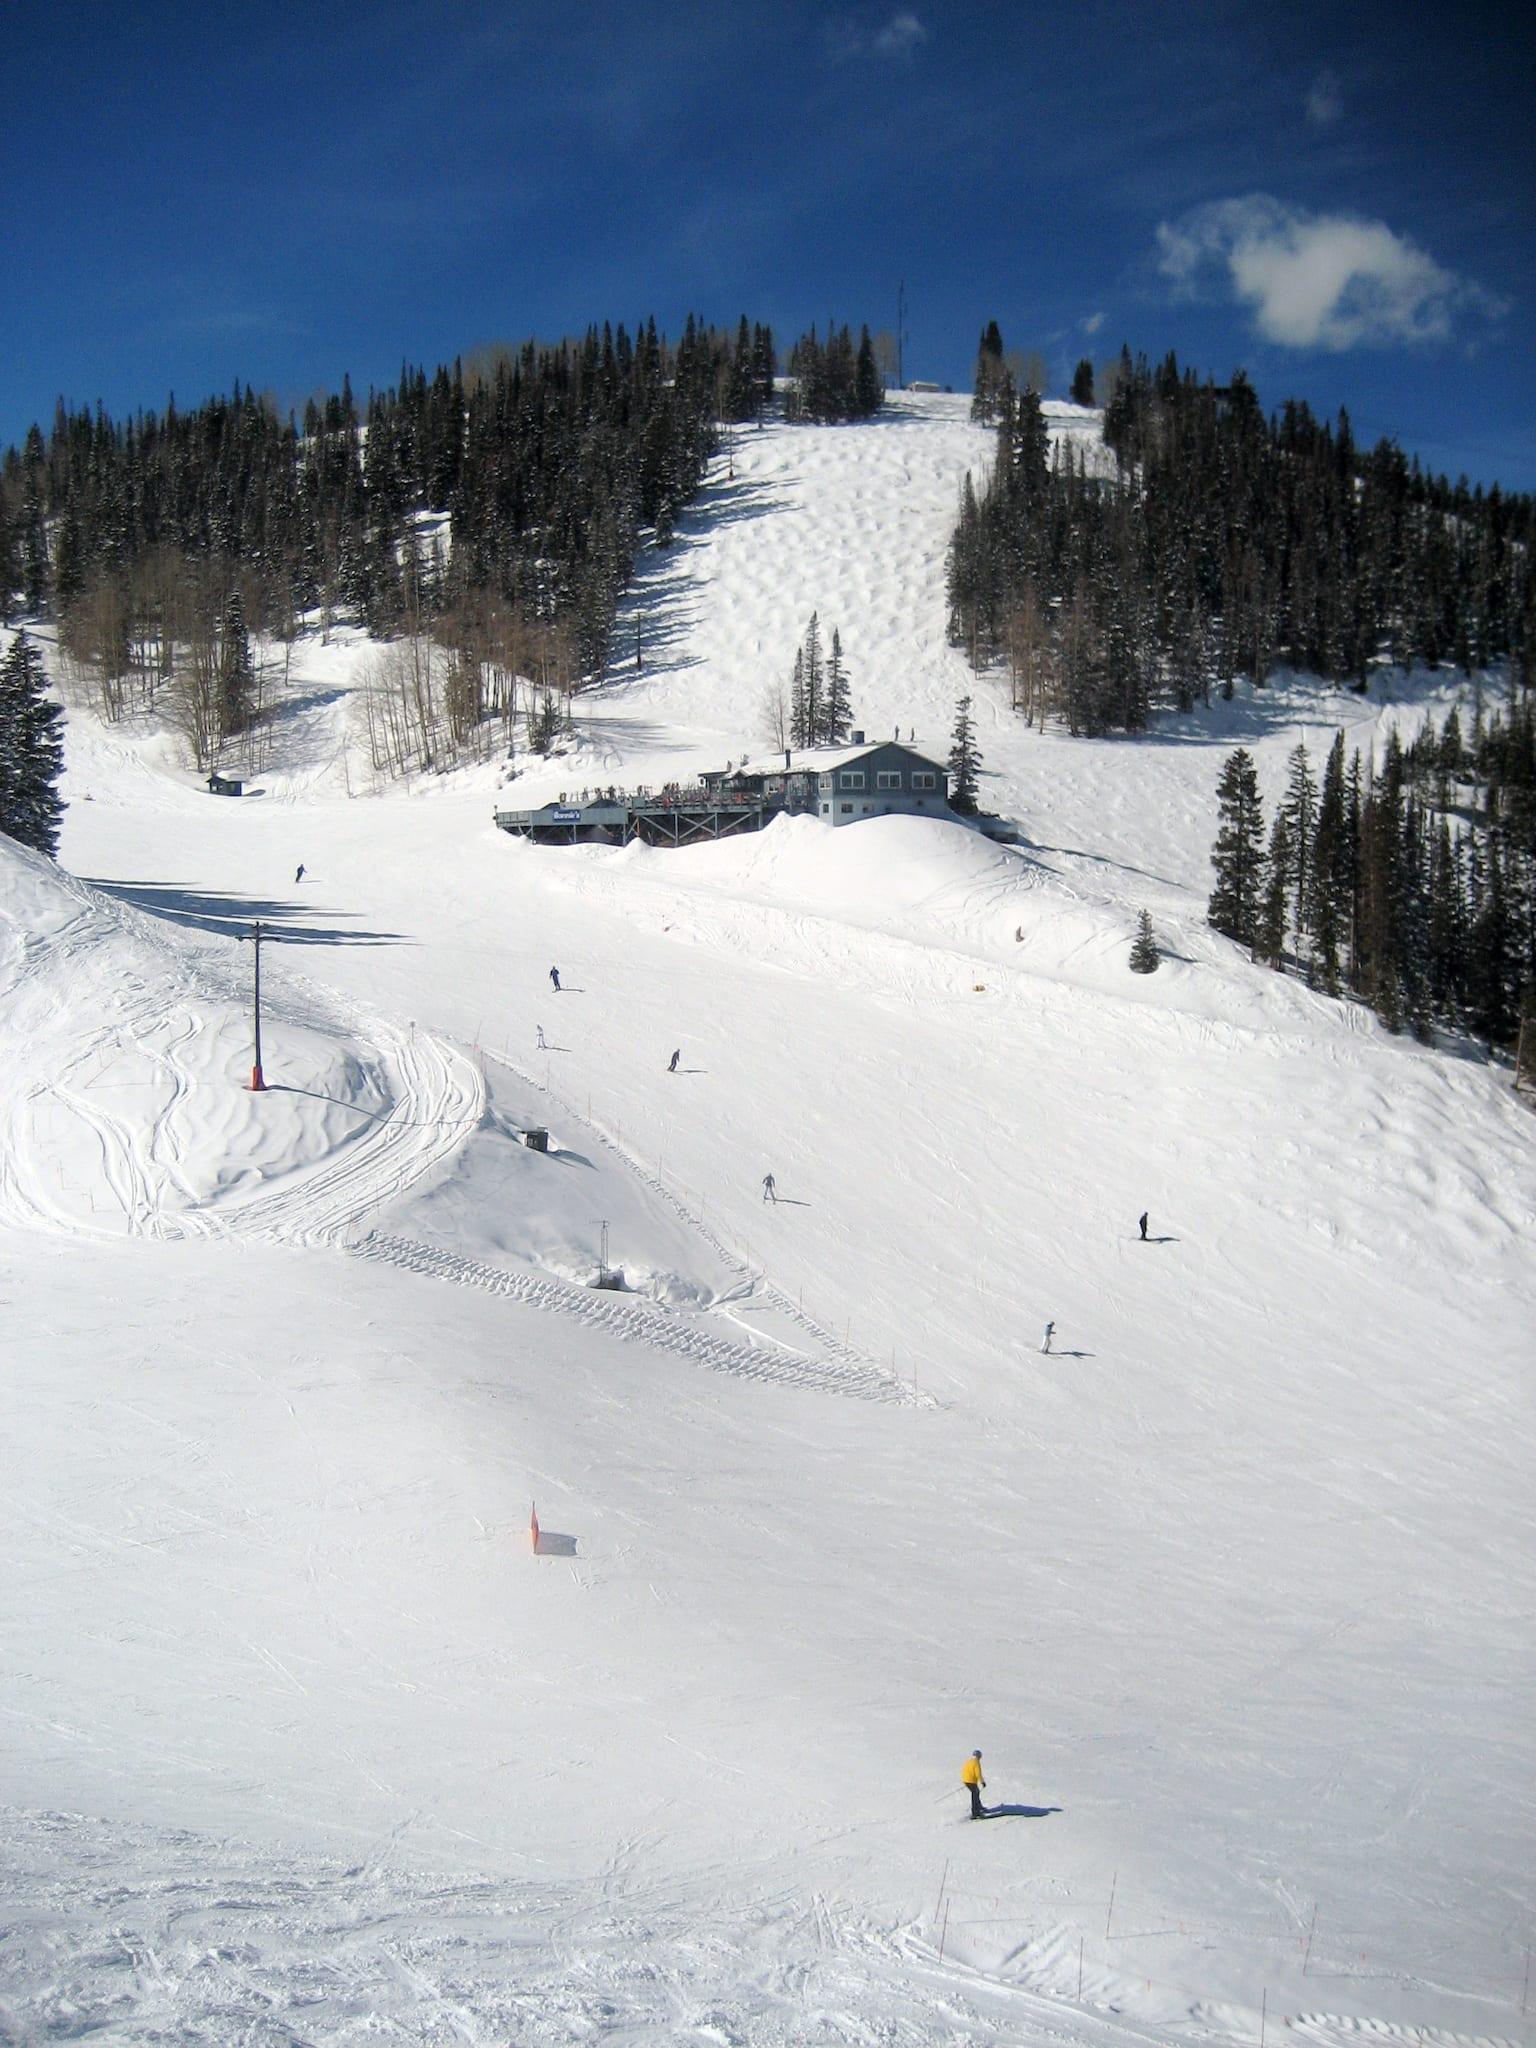 Aspen Mountain Bonnie's Restaurant View from Ajax Express Chairlift